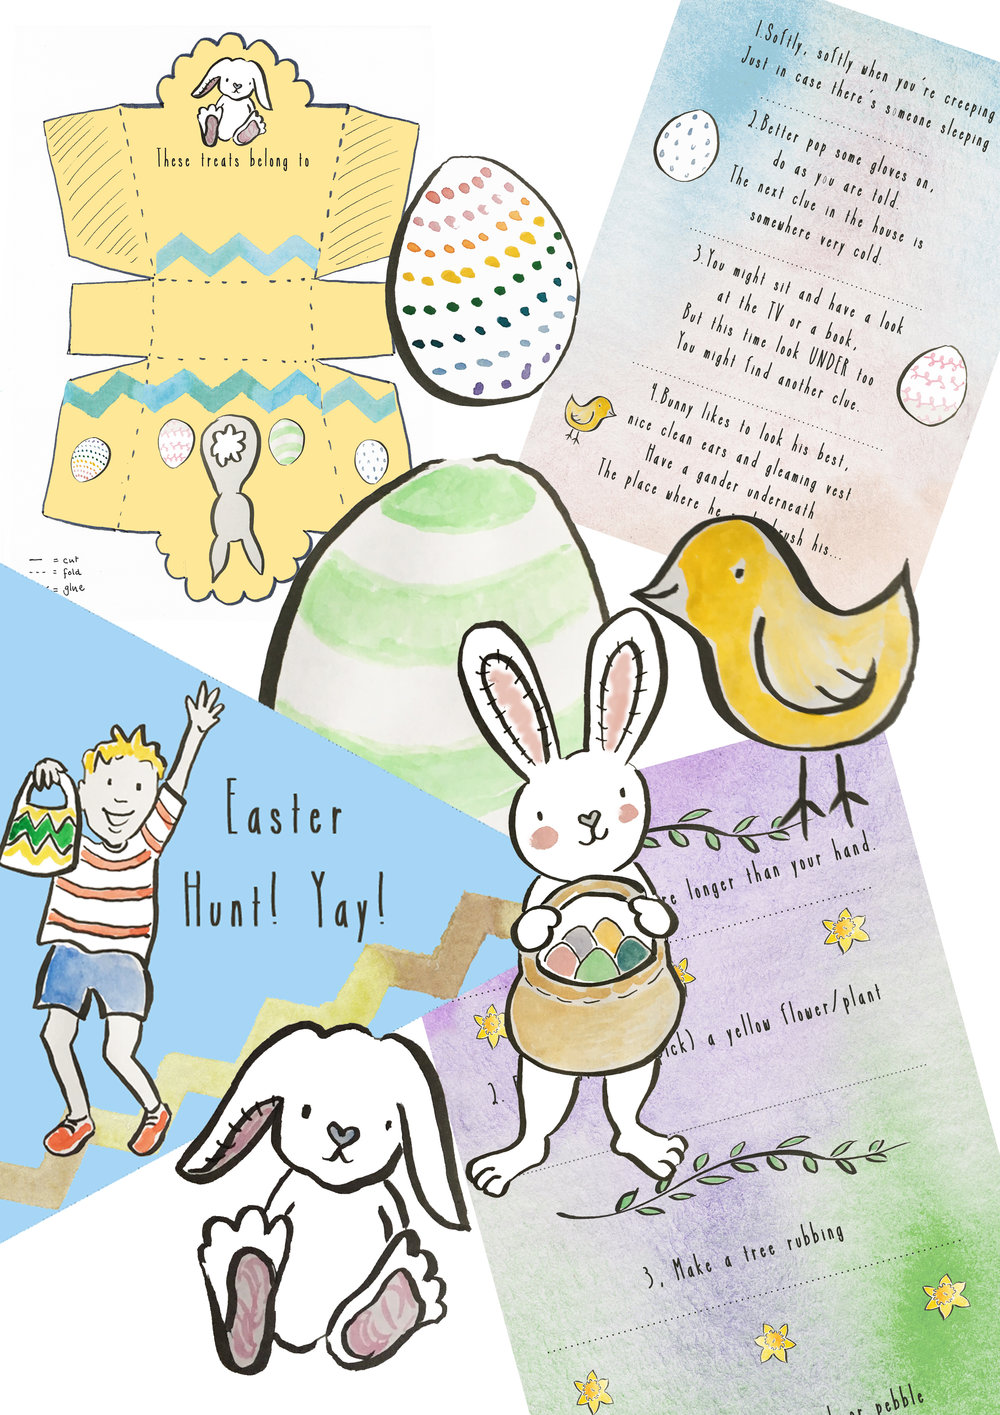 Easter Hunt package